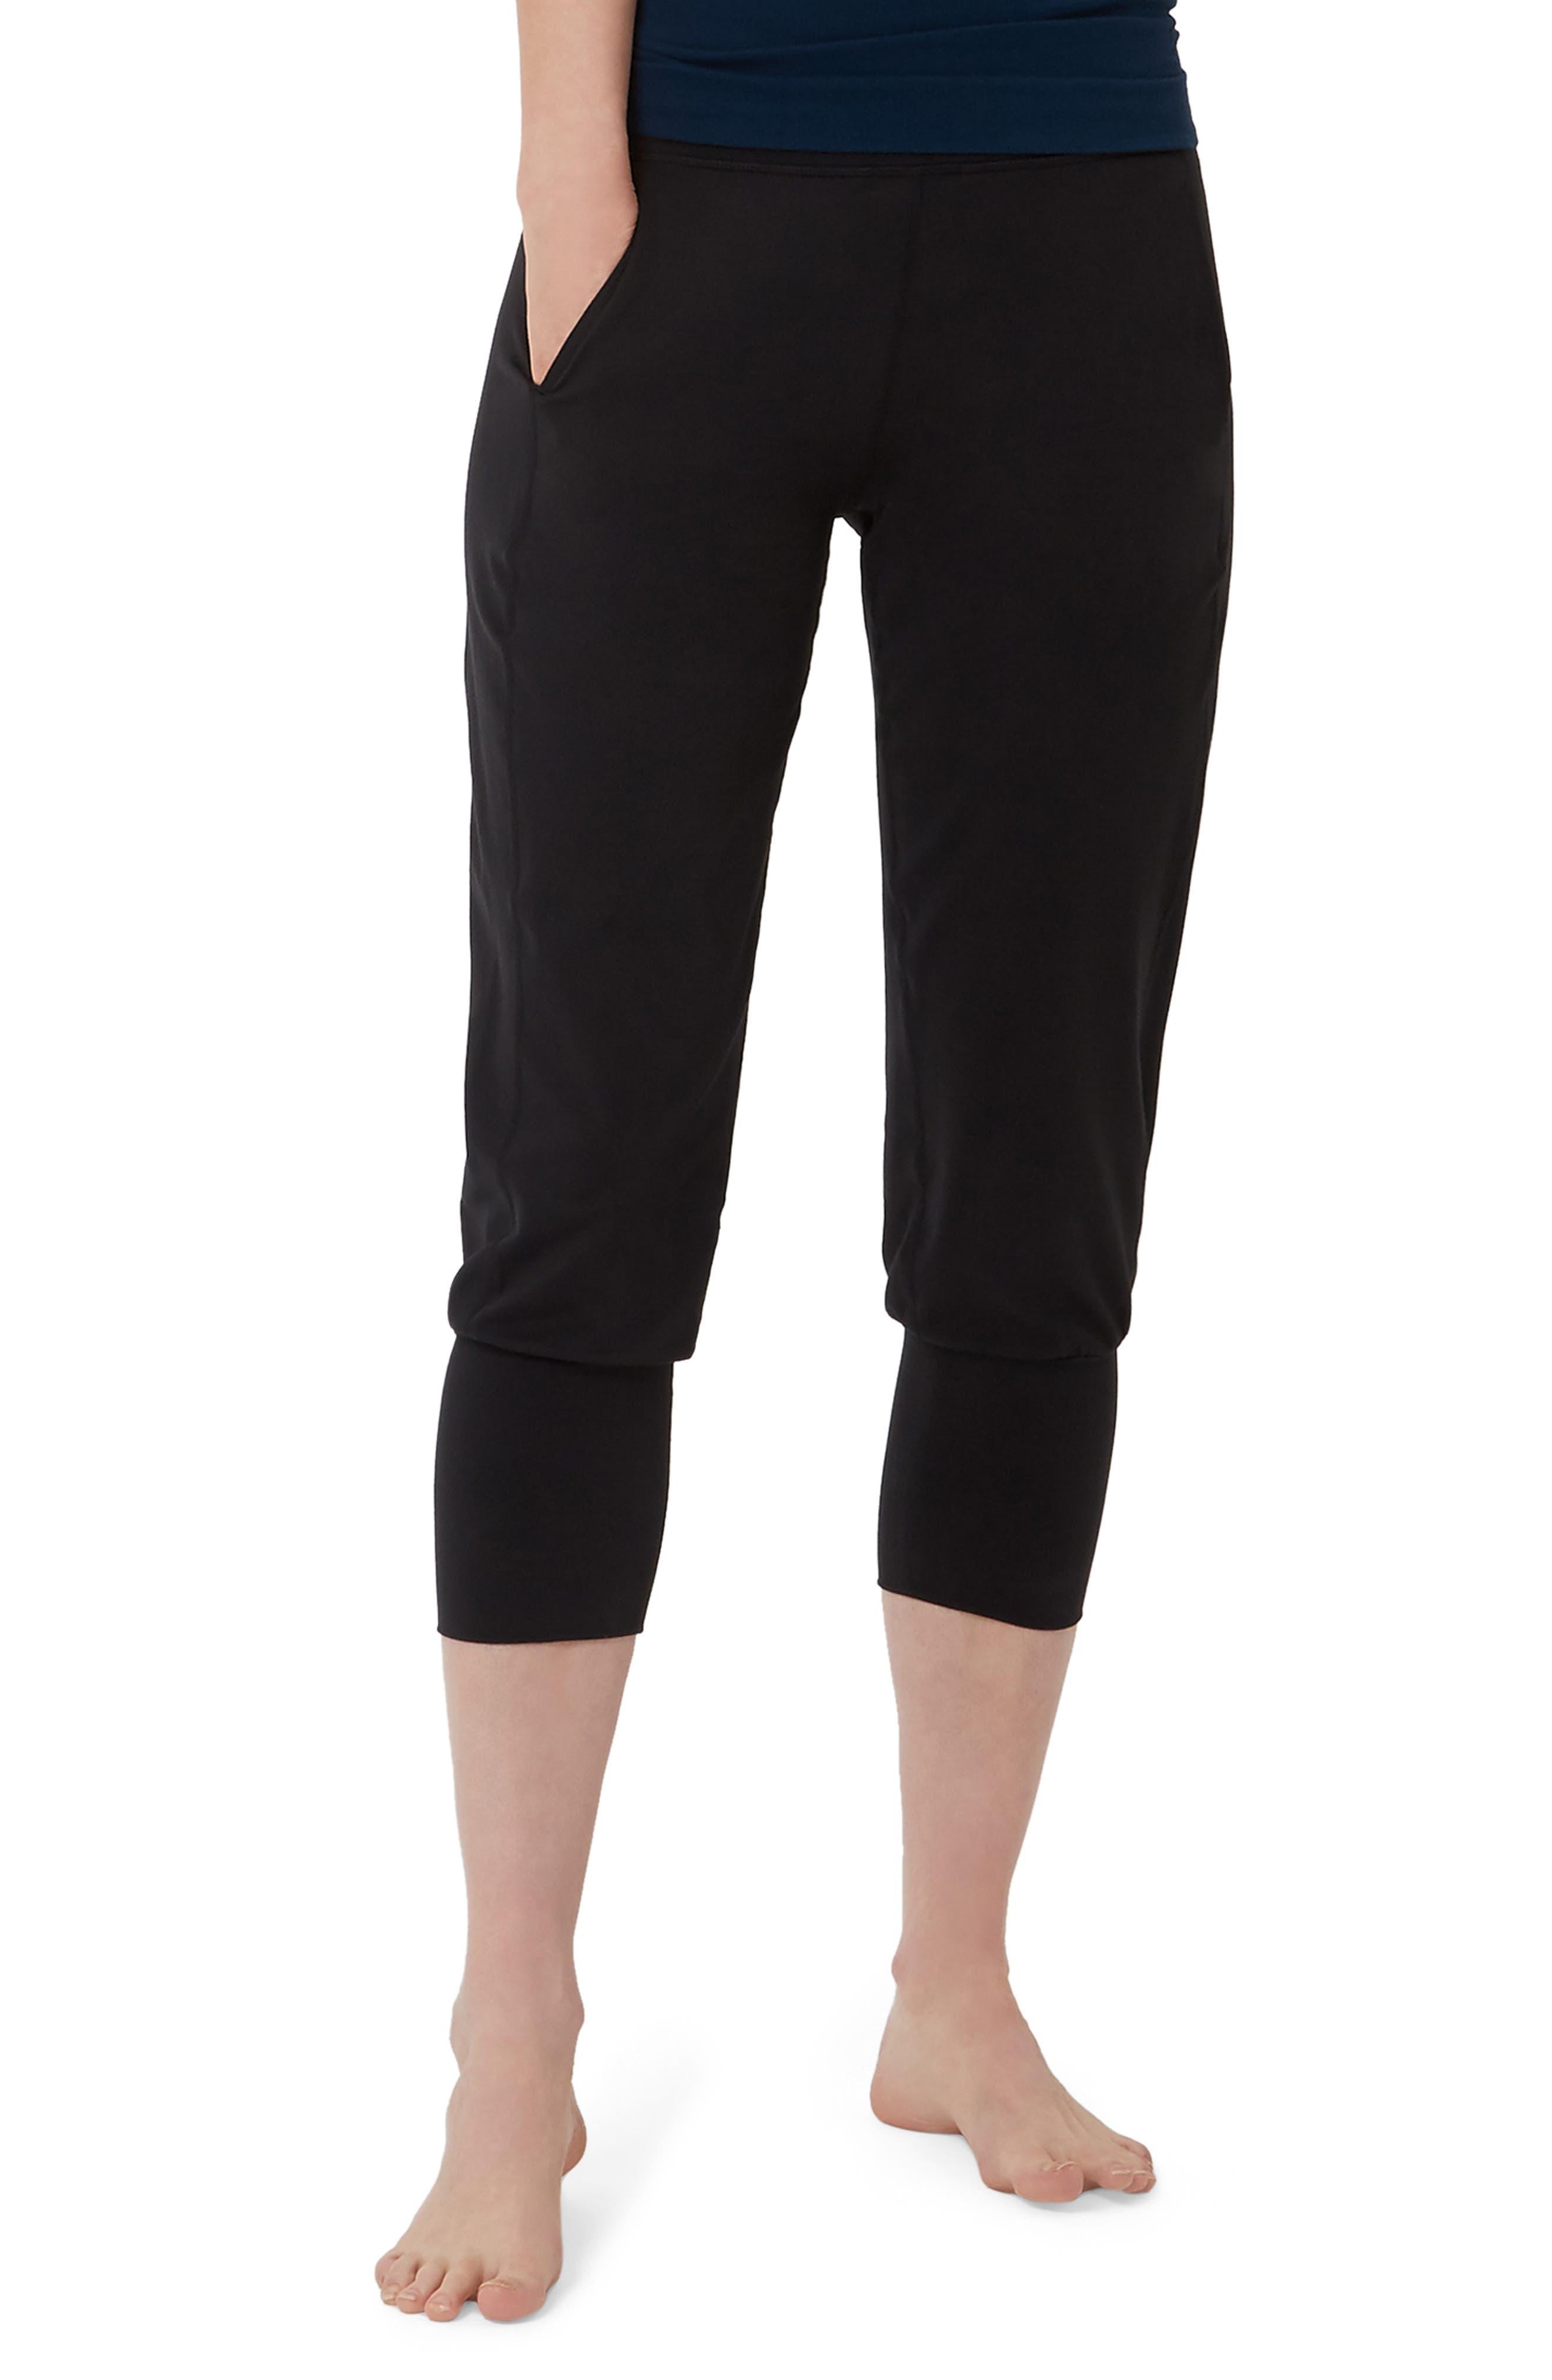 SWEATY BETTY, Garudasana Crop Yoga Trousers, Main thumbnail 1, color, BLACK